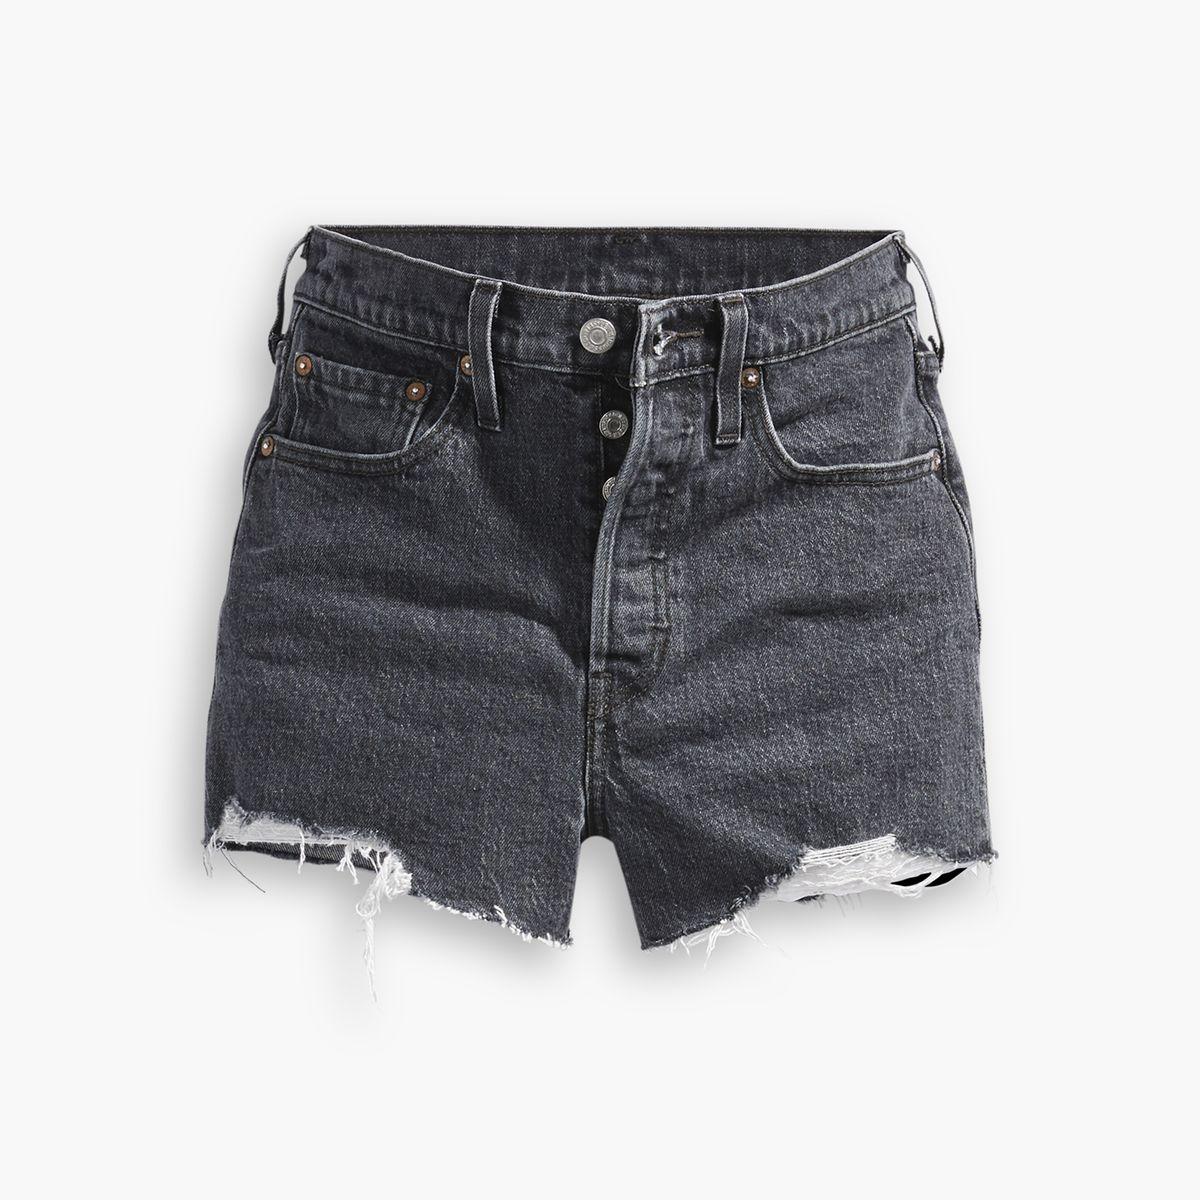 Short Jean 501 HIGH RISE SHORT